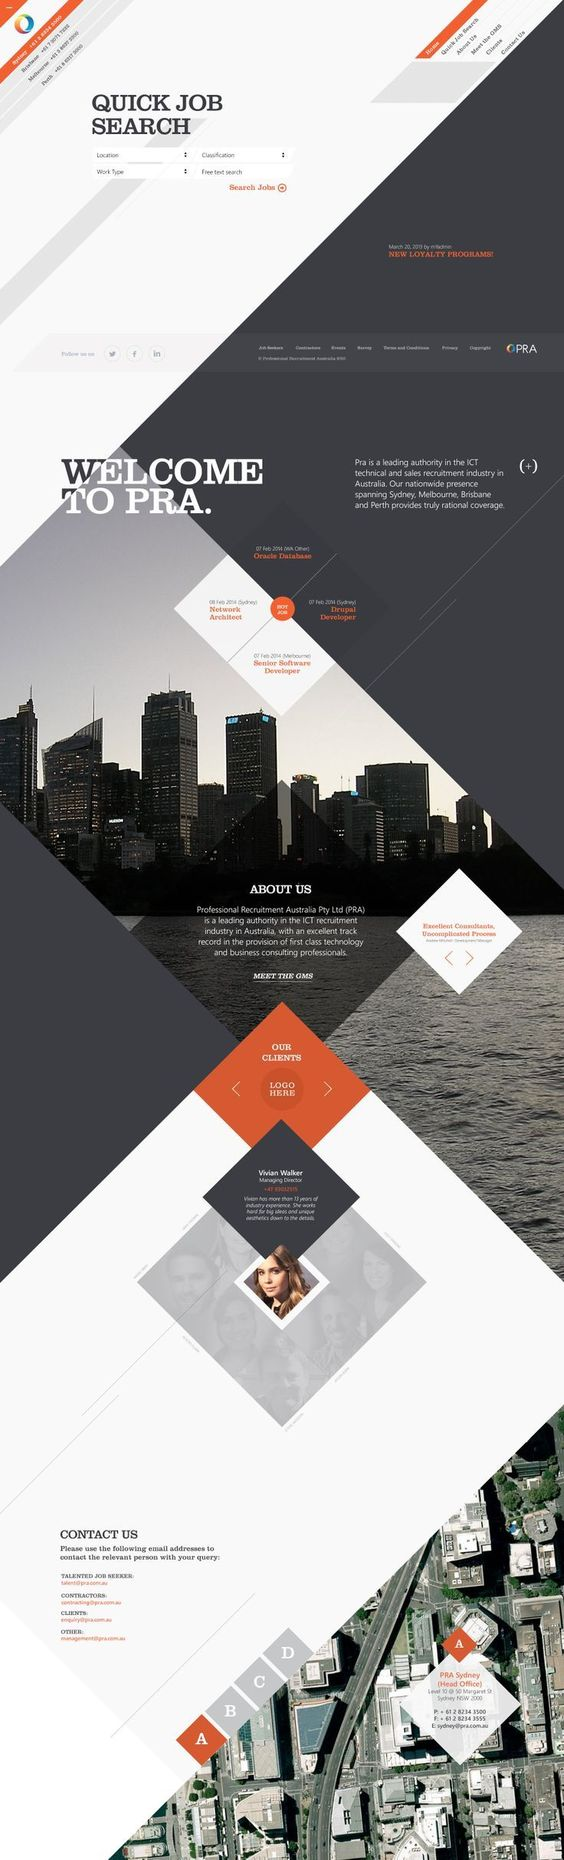 best website designs for inspiration creative stuff latest 20 best website designs for inspiration creative stuff latest news trends on